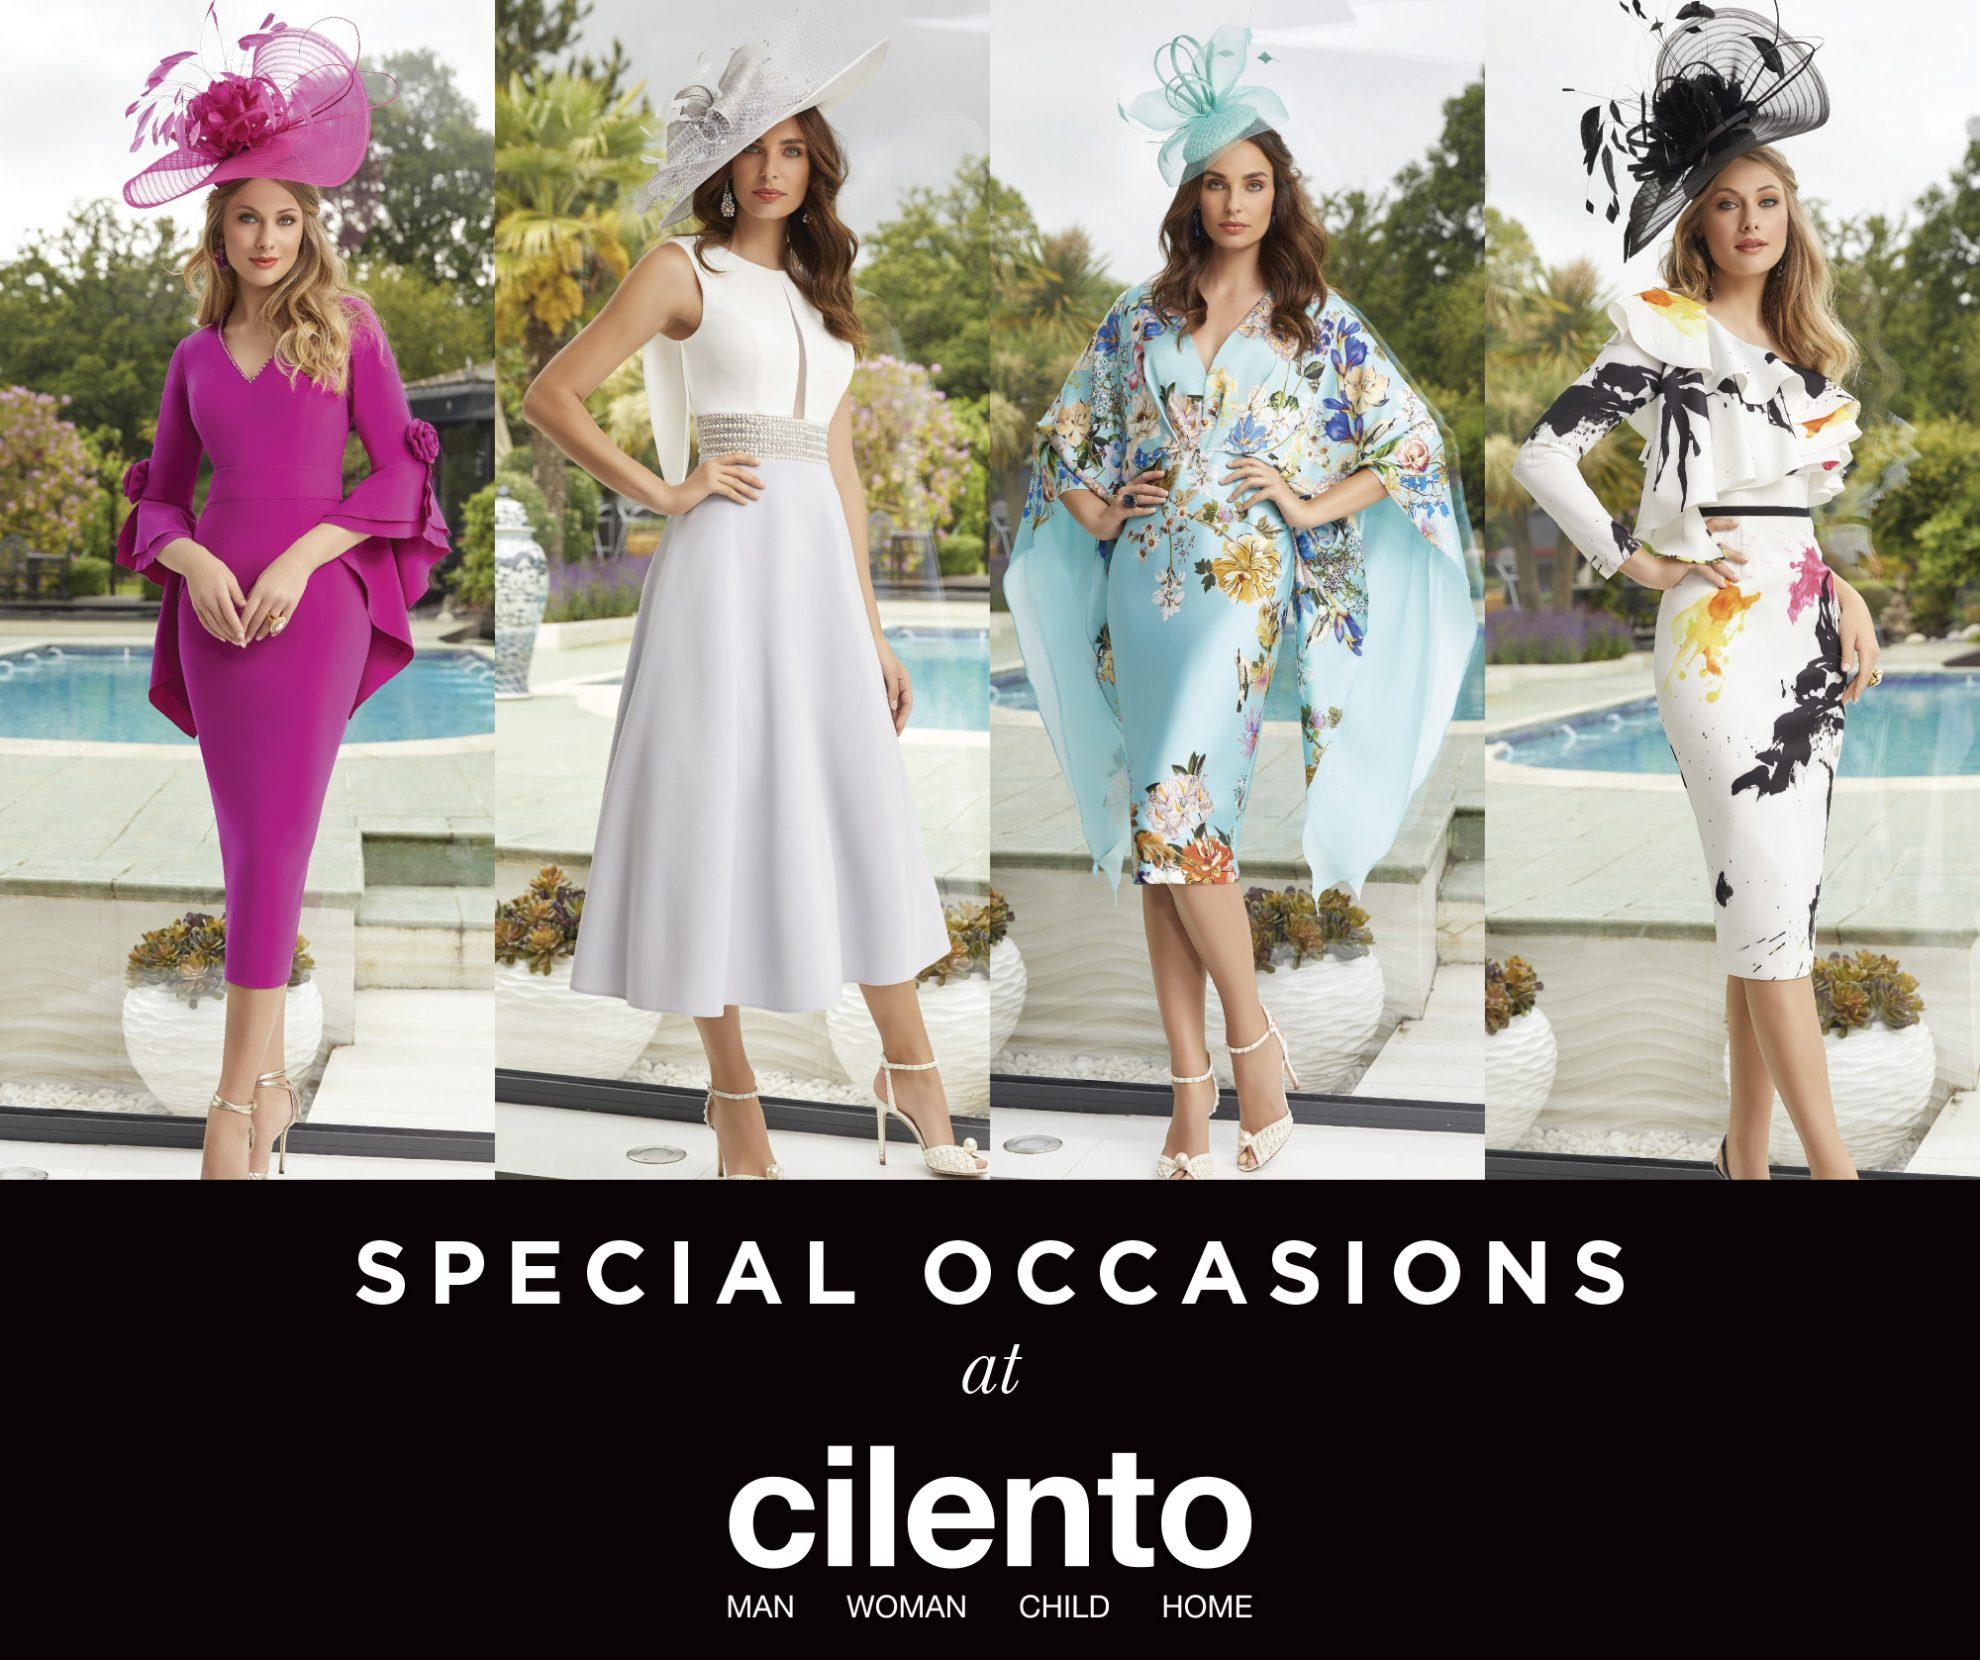 Cilento-Occasionwear